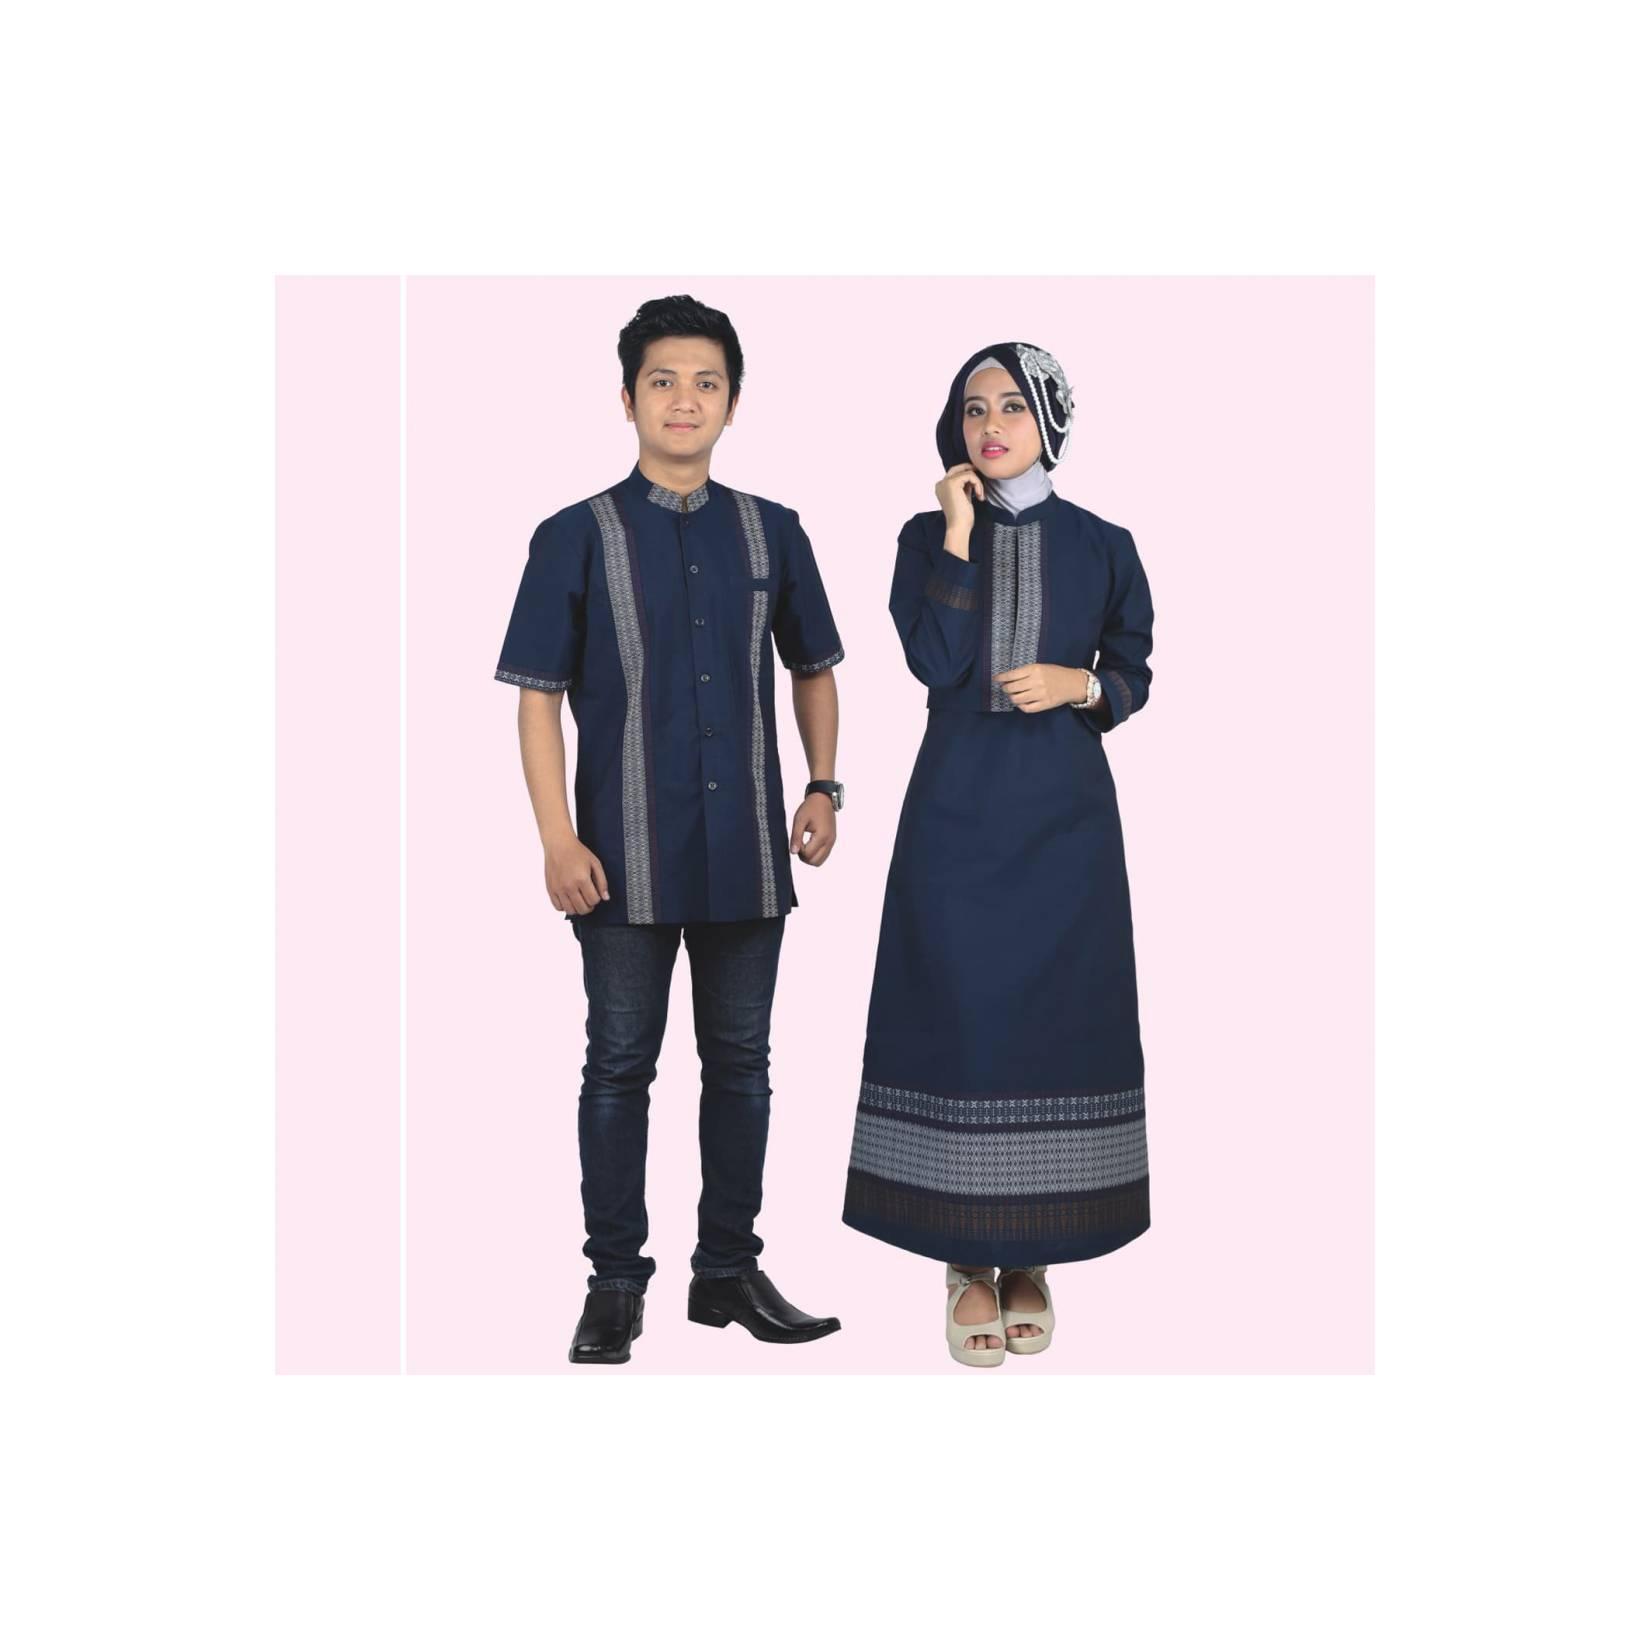 Baju Muslim Modern Terbaru Gamis Koko Couple Anak Pria Wanita Biru